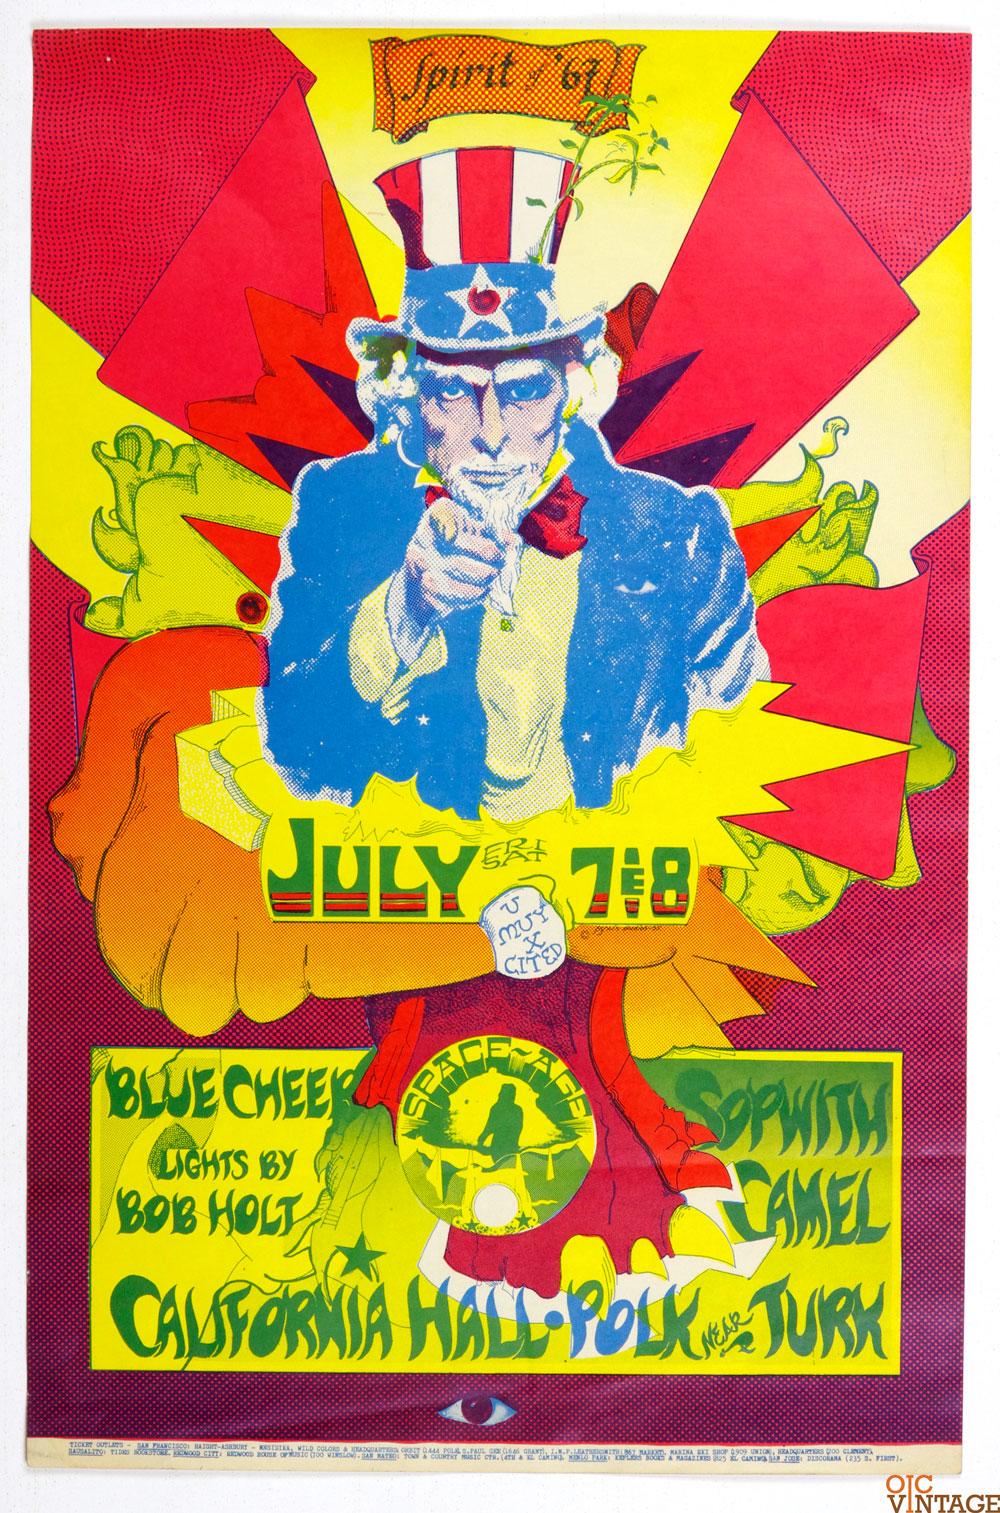 Blue Cheer Poster AOR 2.149 California Hall 1967 Jul 7